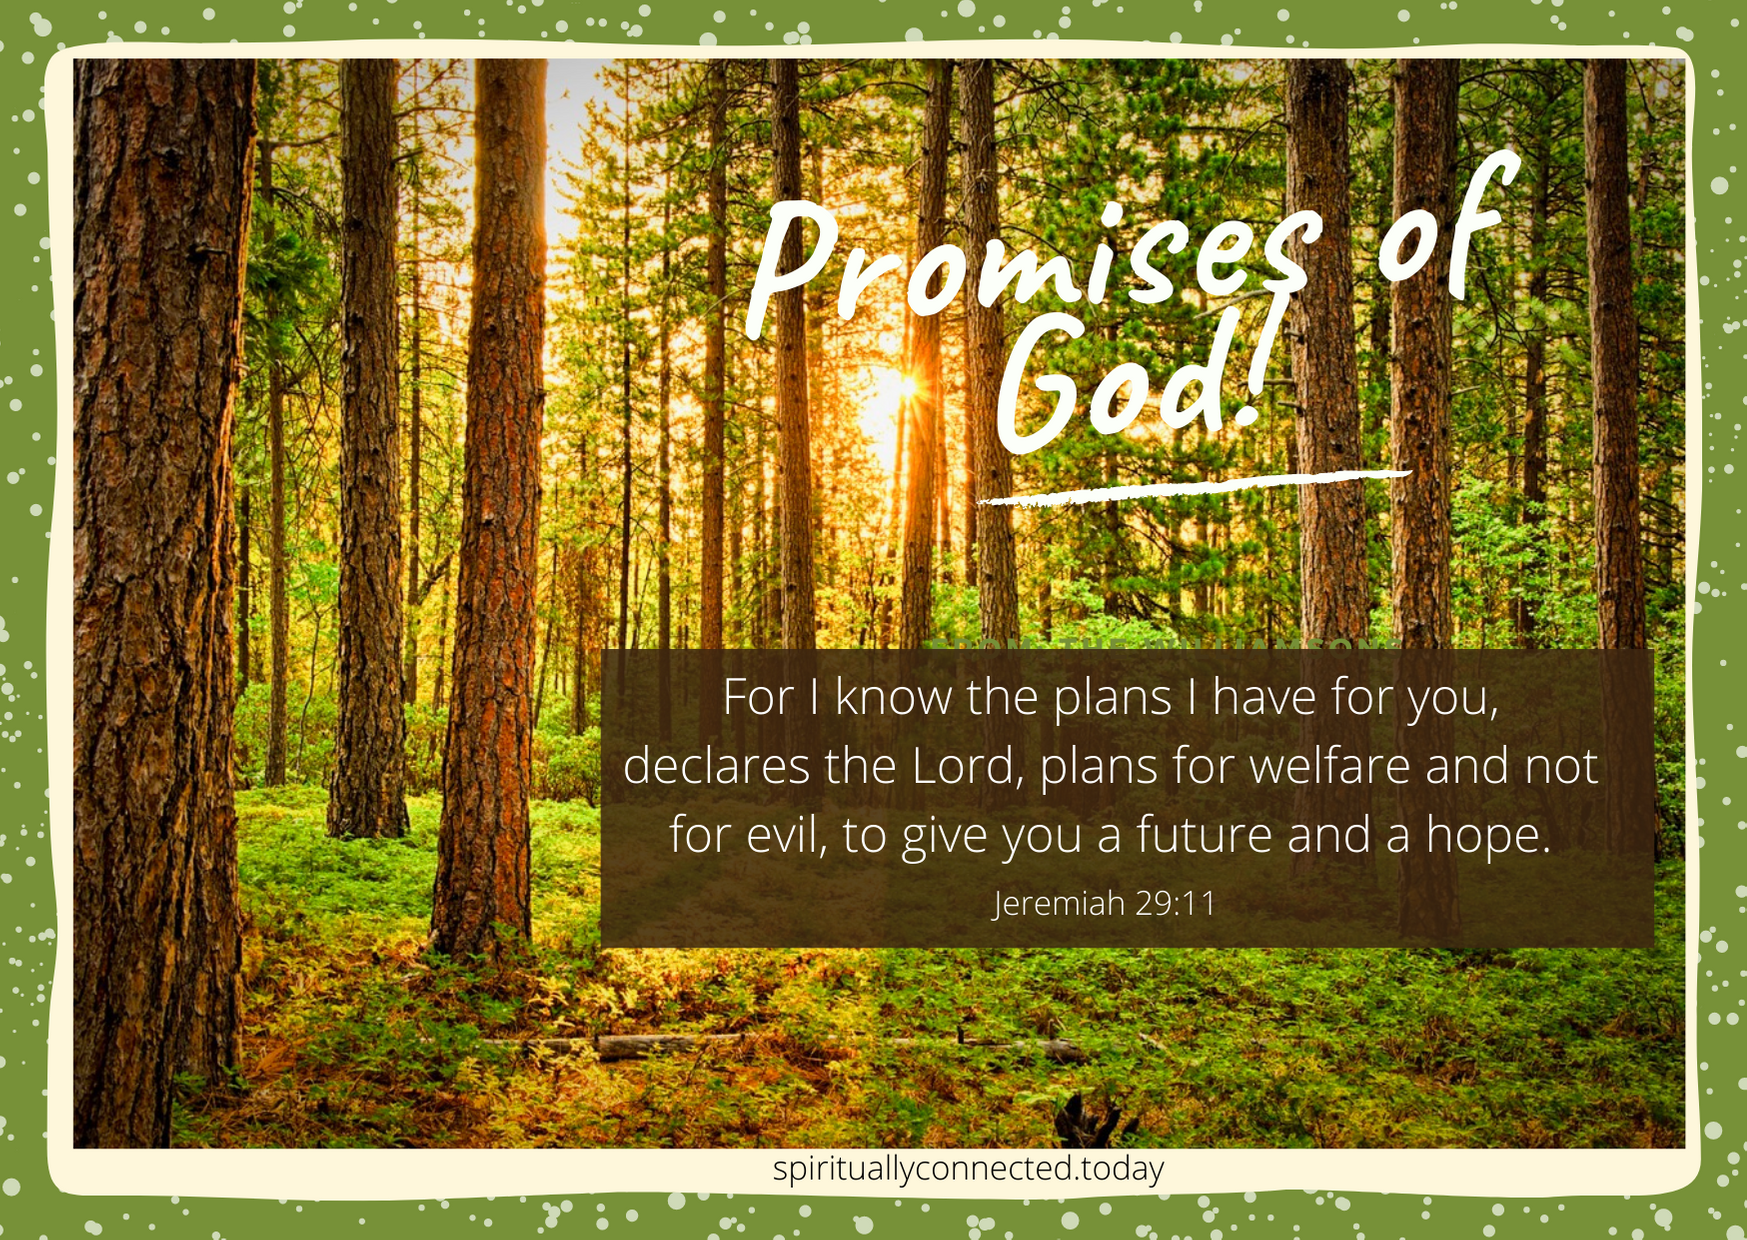 Walk in the Wisdom of God